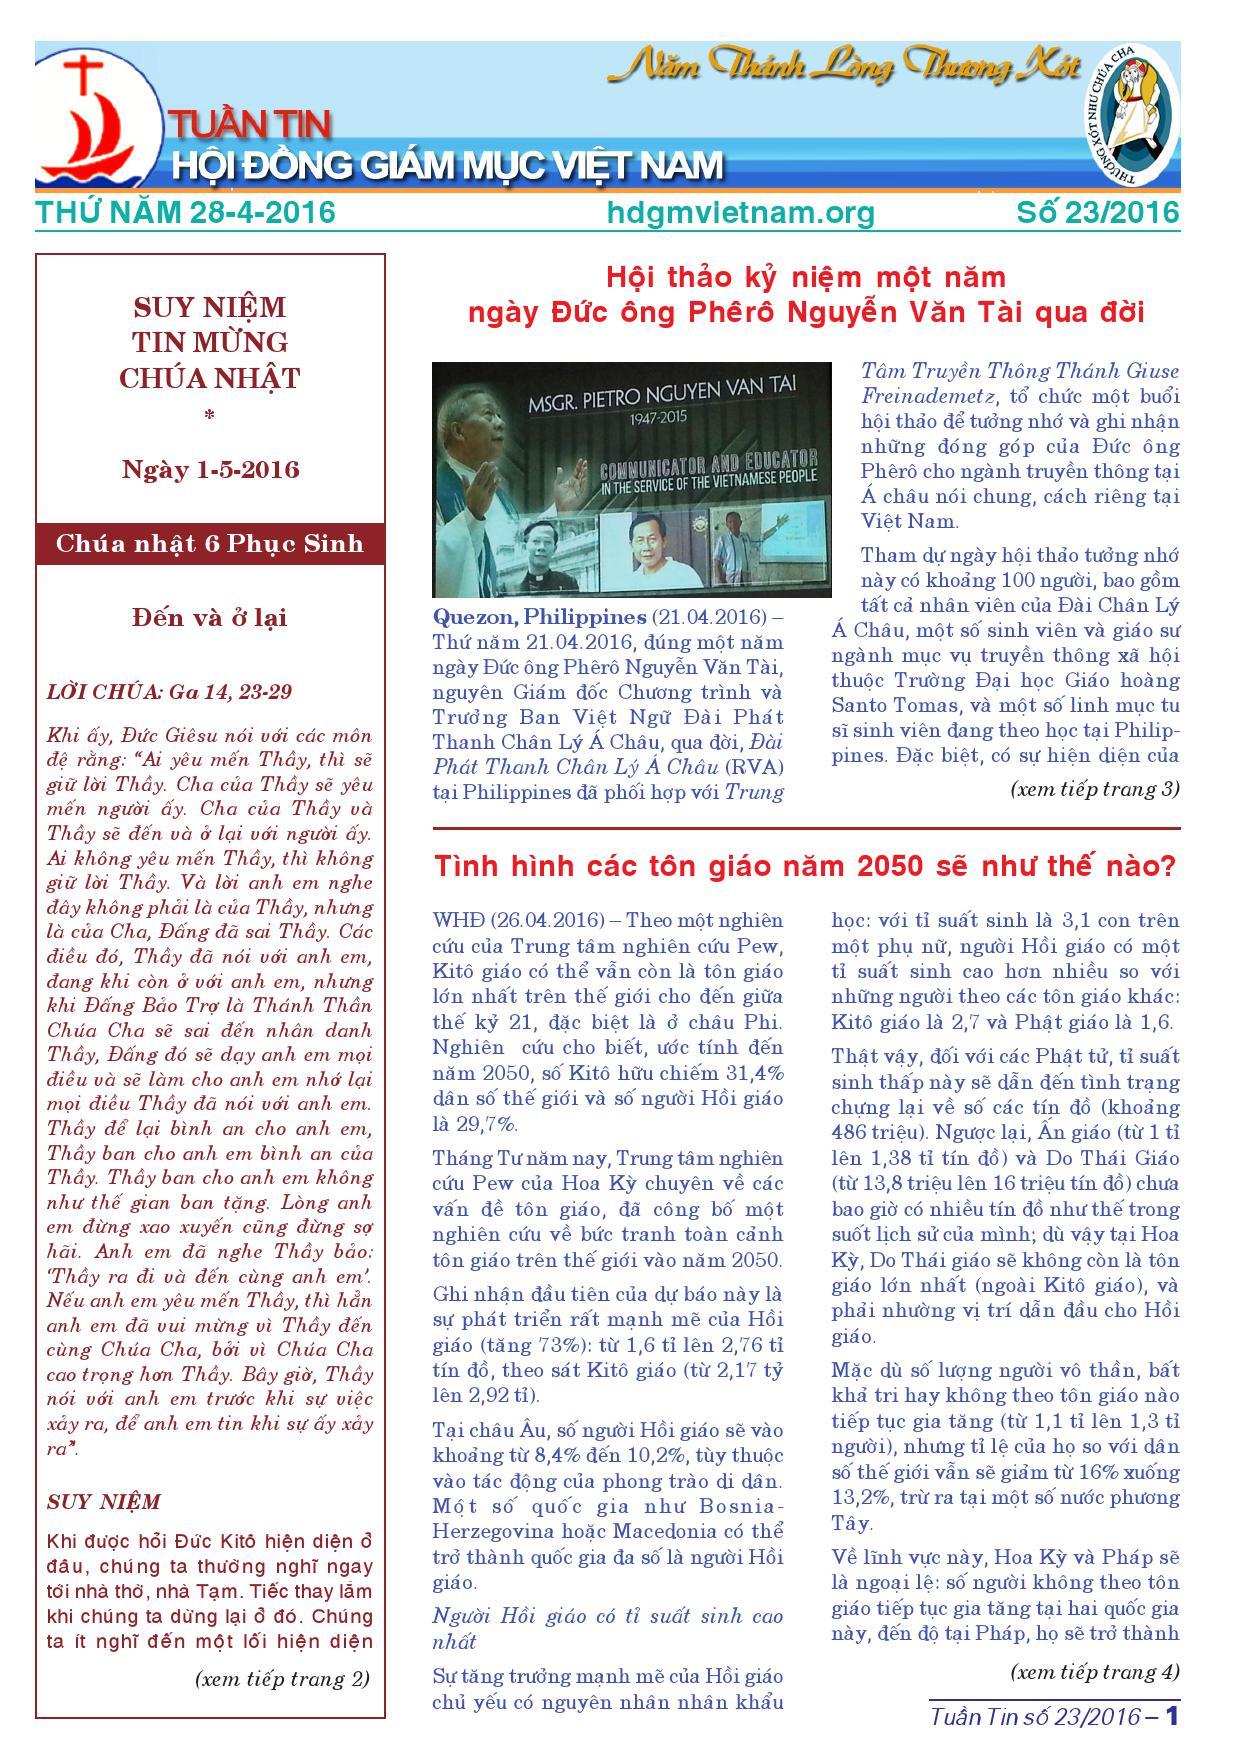 Tuần tin HĐGMVN số 23/2016